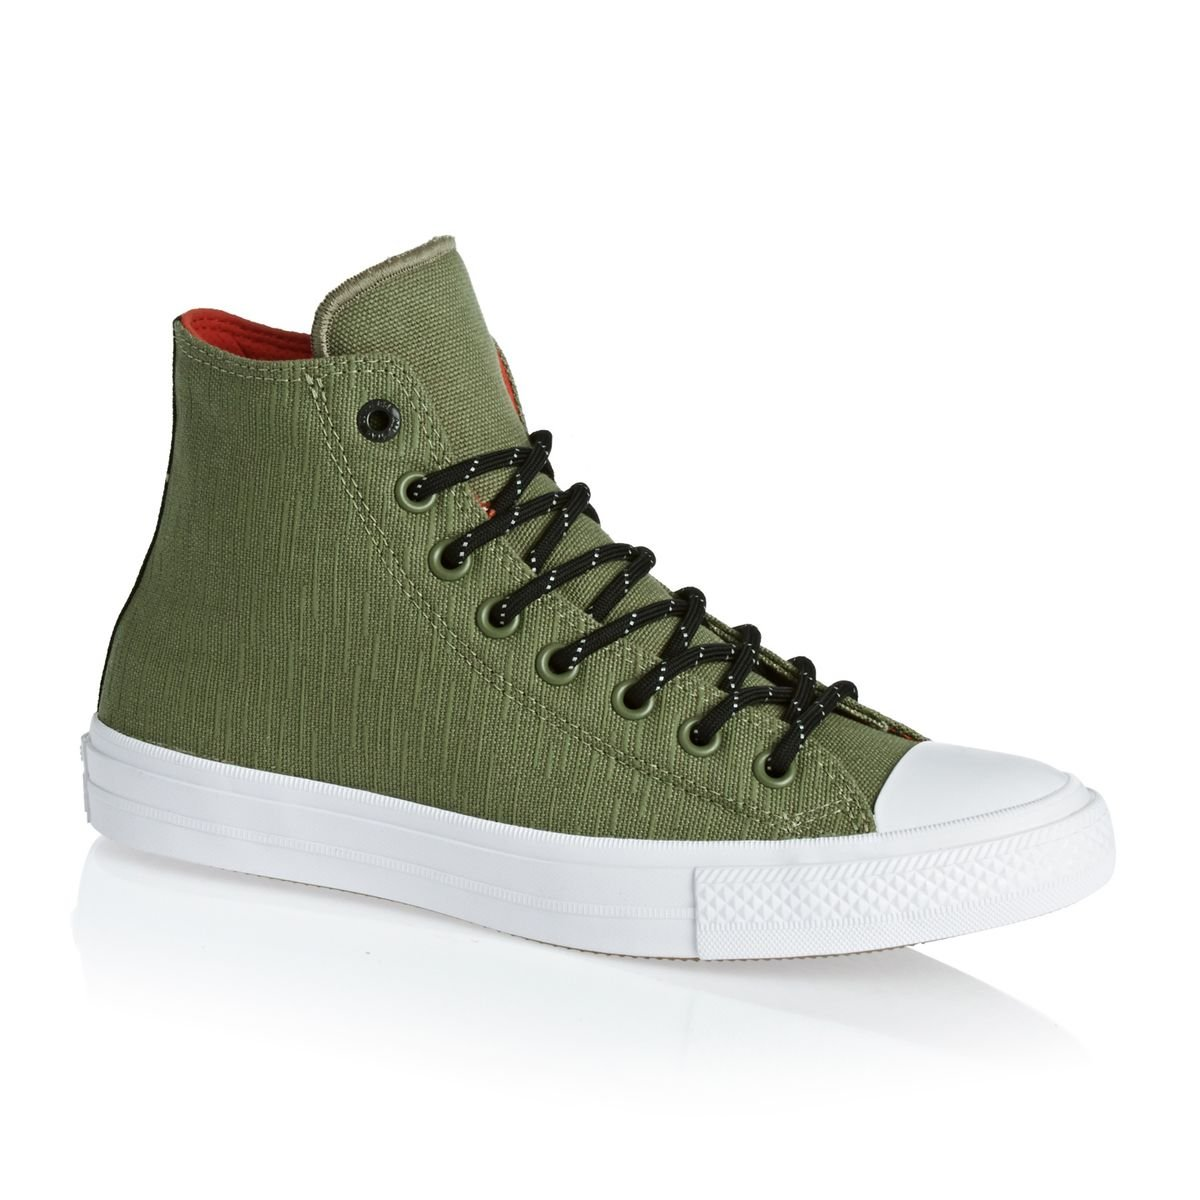 Converse Trainers Chuck Taylor All Star Chuck II Shied zapatos – Anti-Fatigue verde señal rojo -